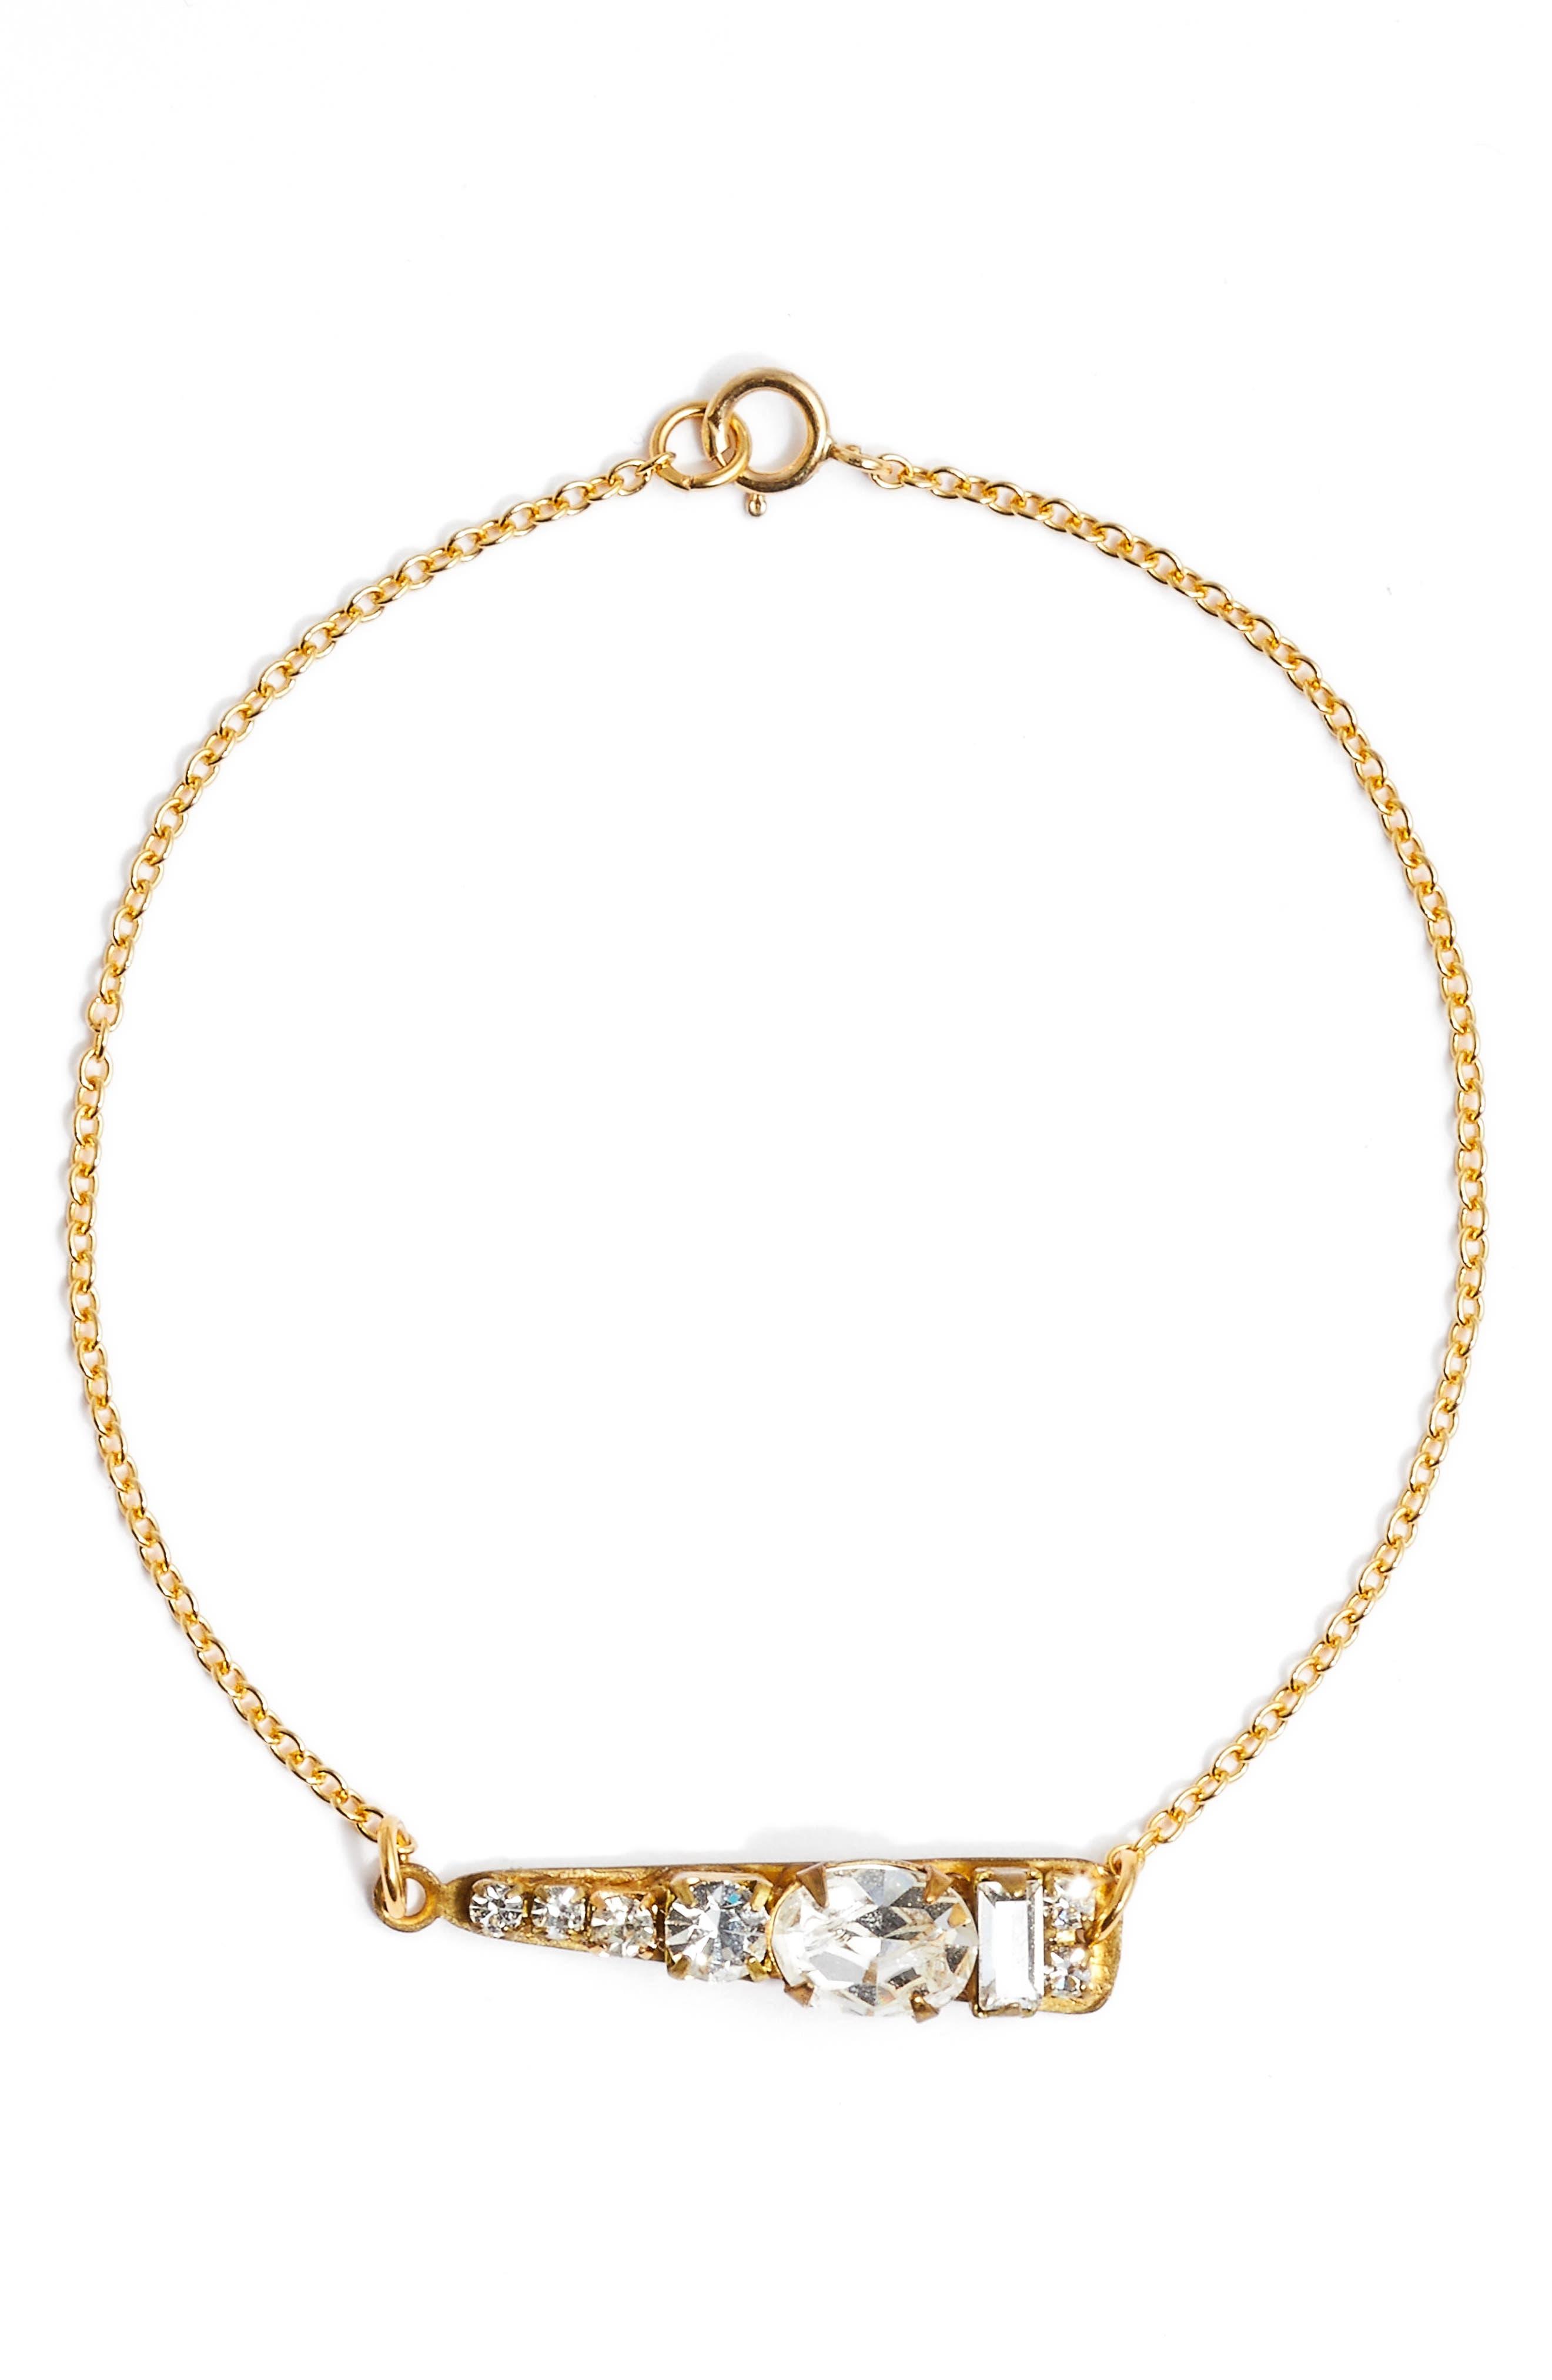 Alternate Image 1 Selected - Sandy Hyun Mixed Crystal Bracelet